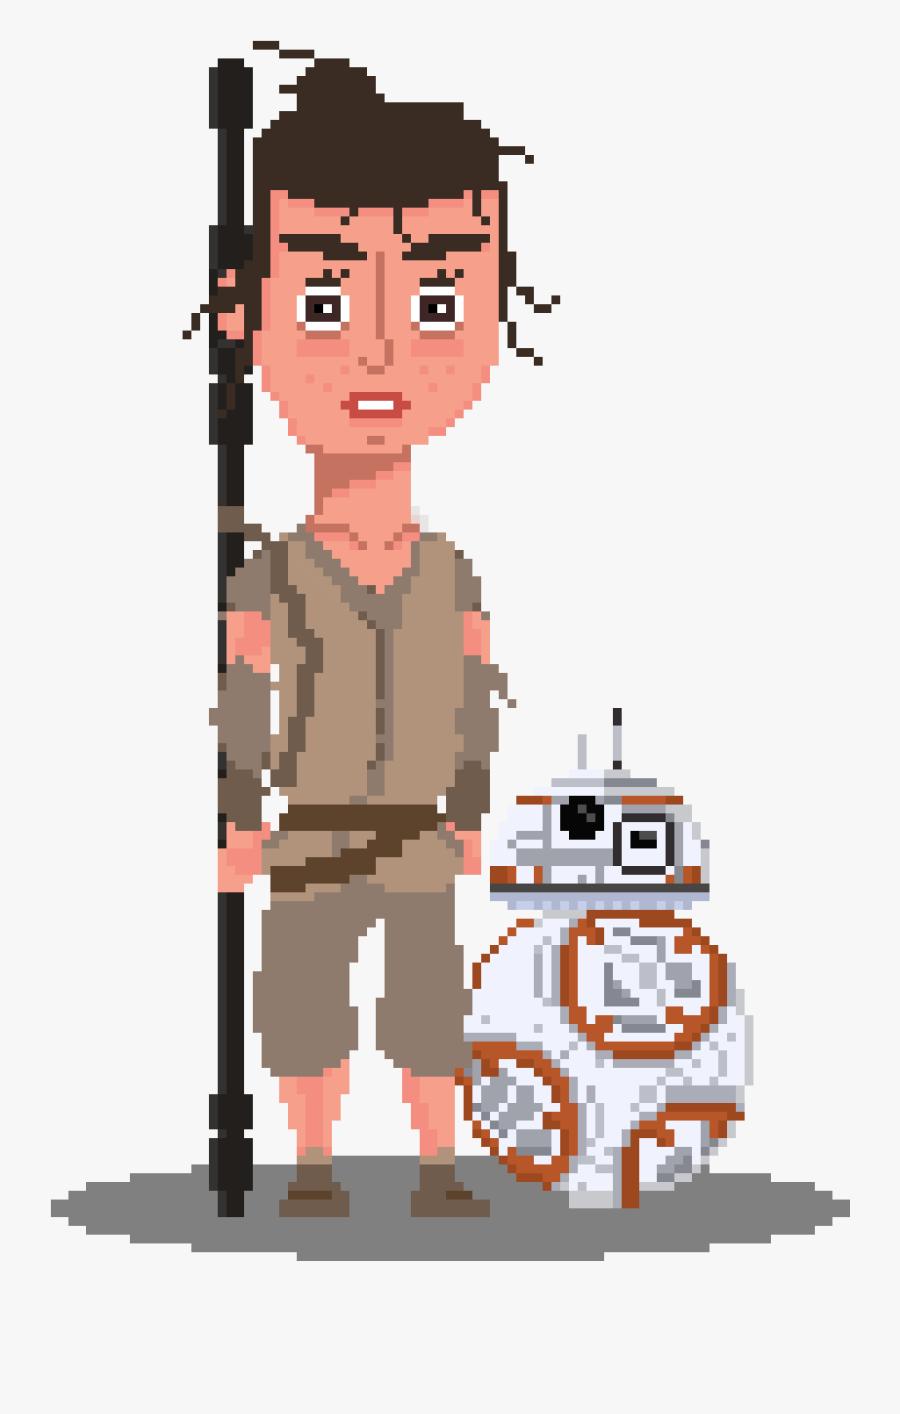 Transparent Rey Star Wars Clipart - Cartoon, Transparent Clipart